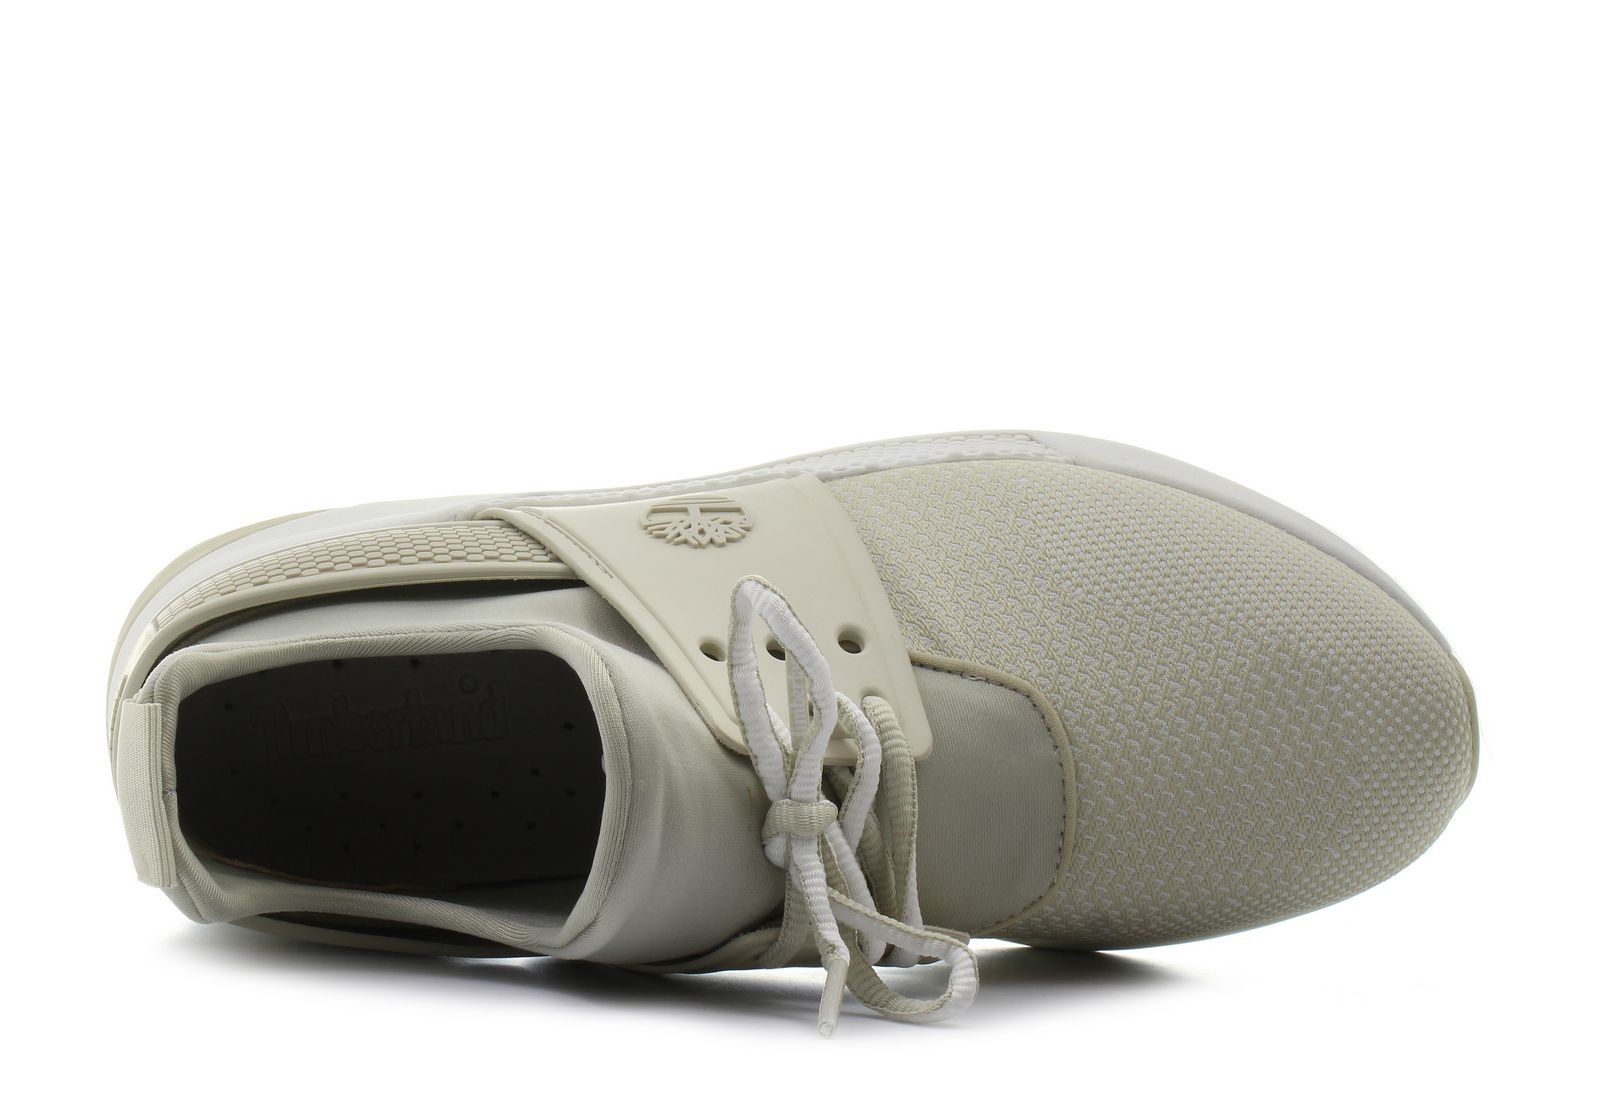 ea10f2939b96 Timberland Cipő - Kiri Knitted - A1MLG-wht - Office Shoes Magyarország